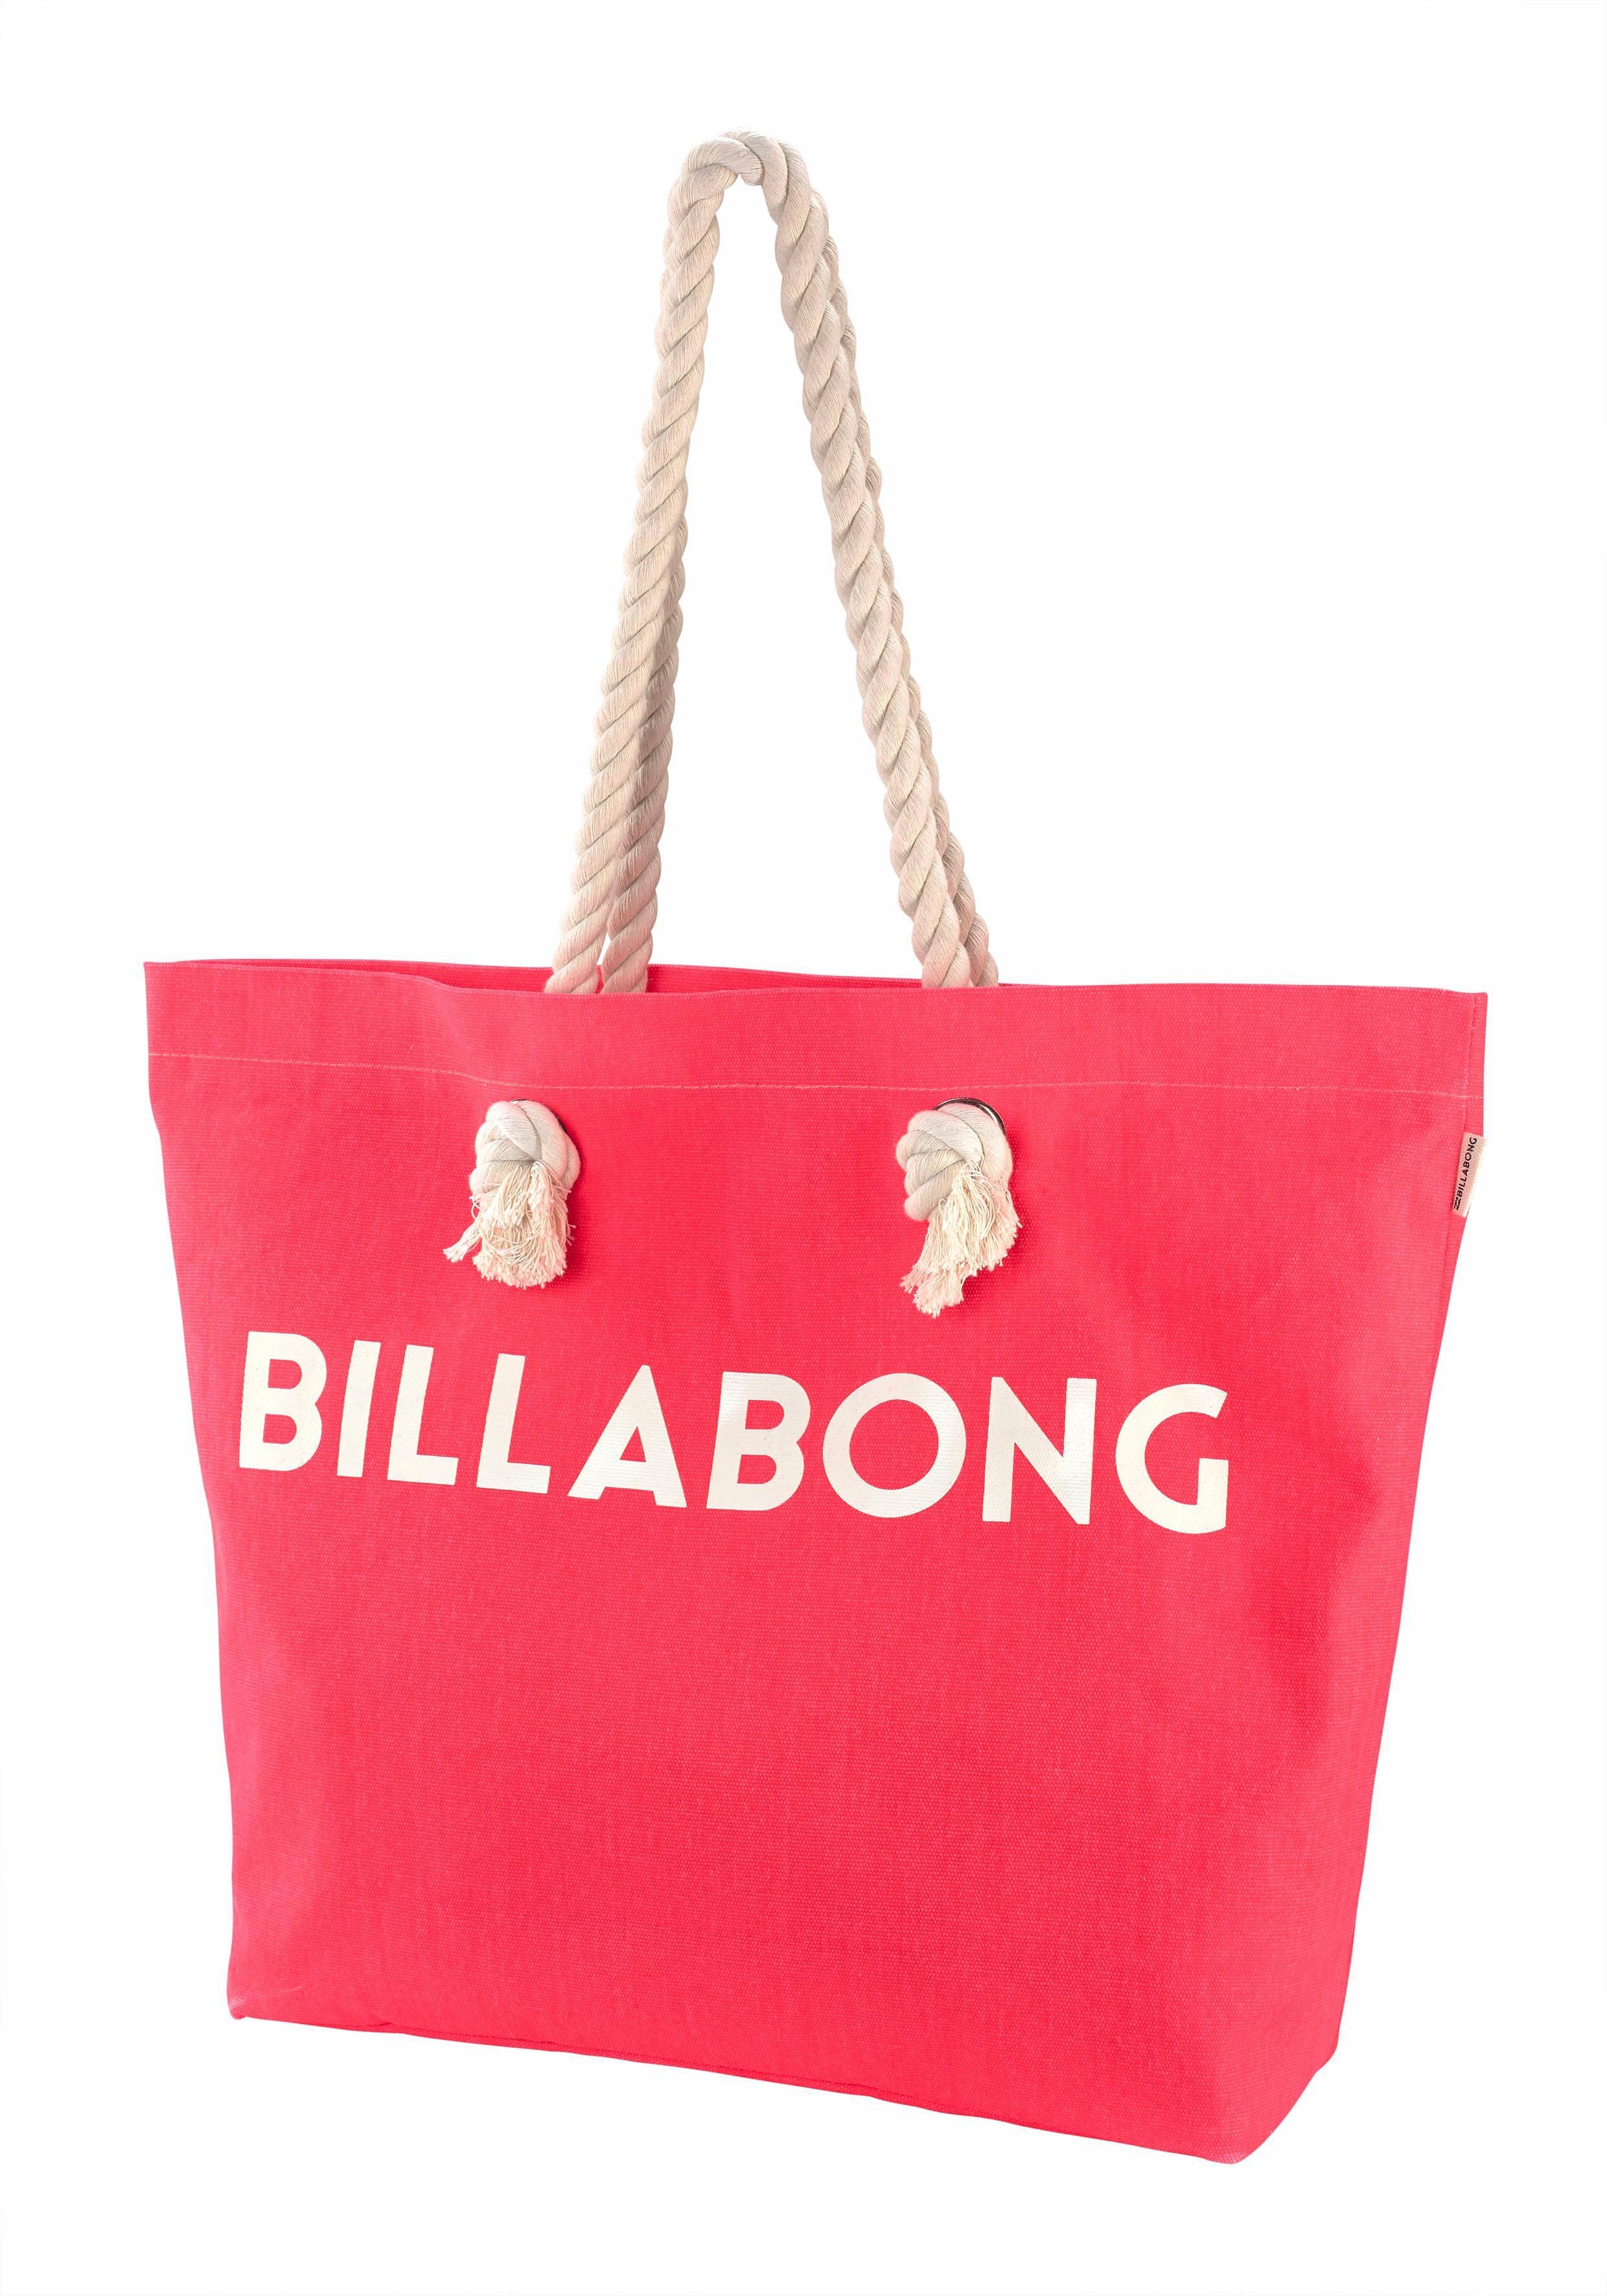 Strandtassen Kopen : Strandtas kopen zomerse strandtassen je hier otto